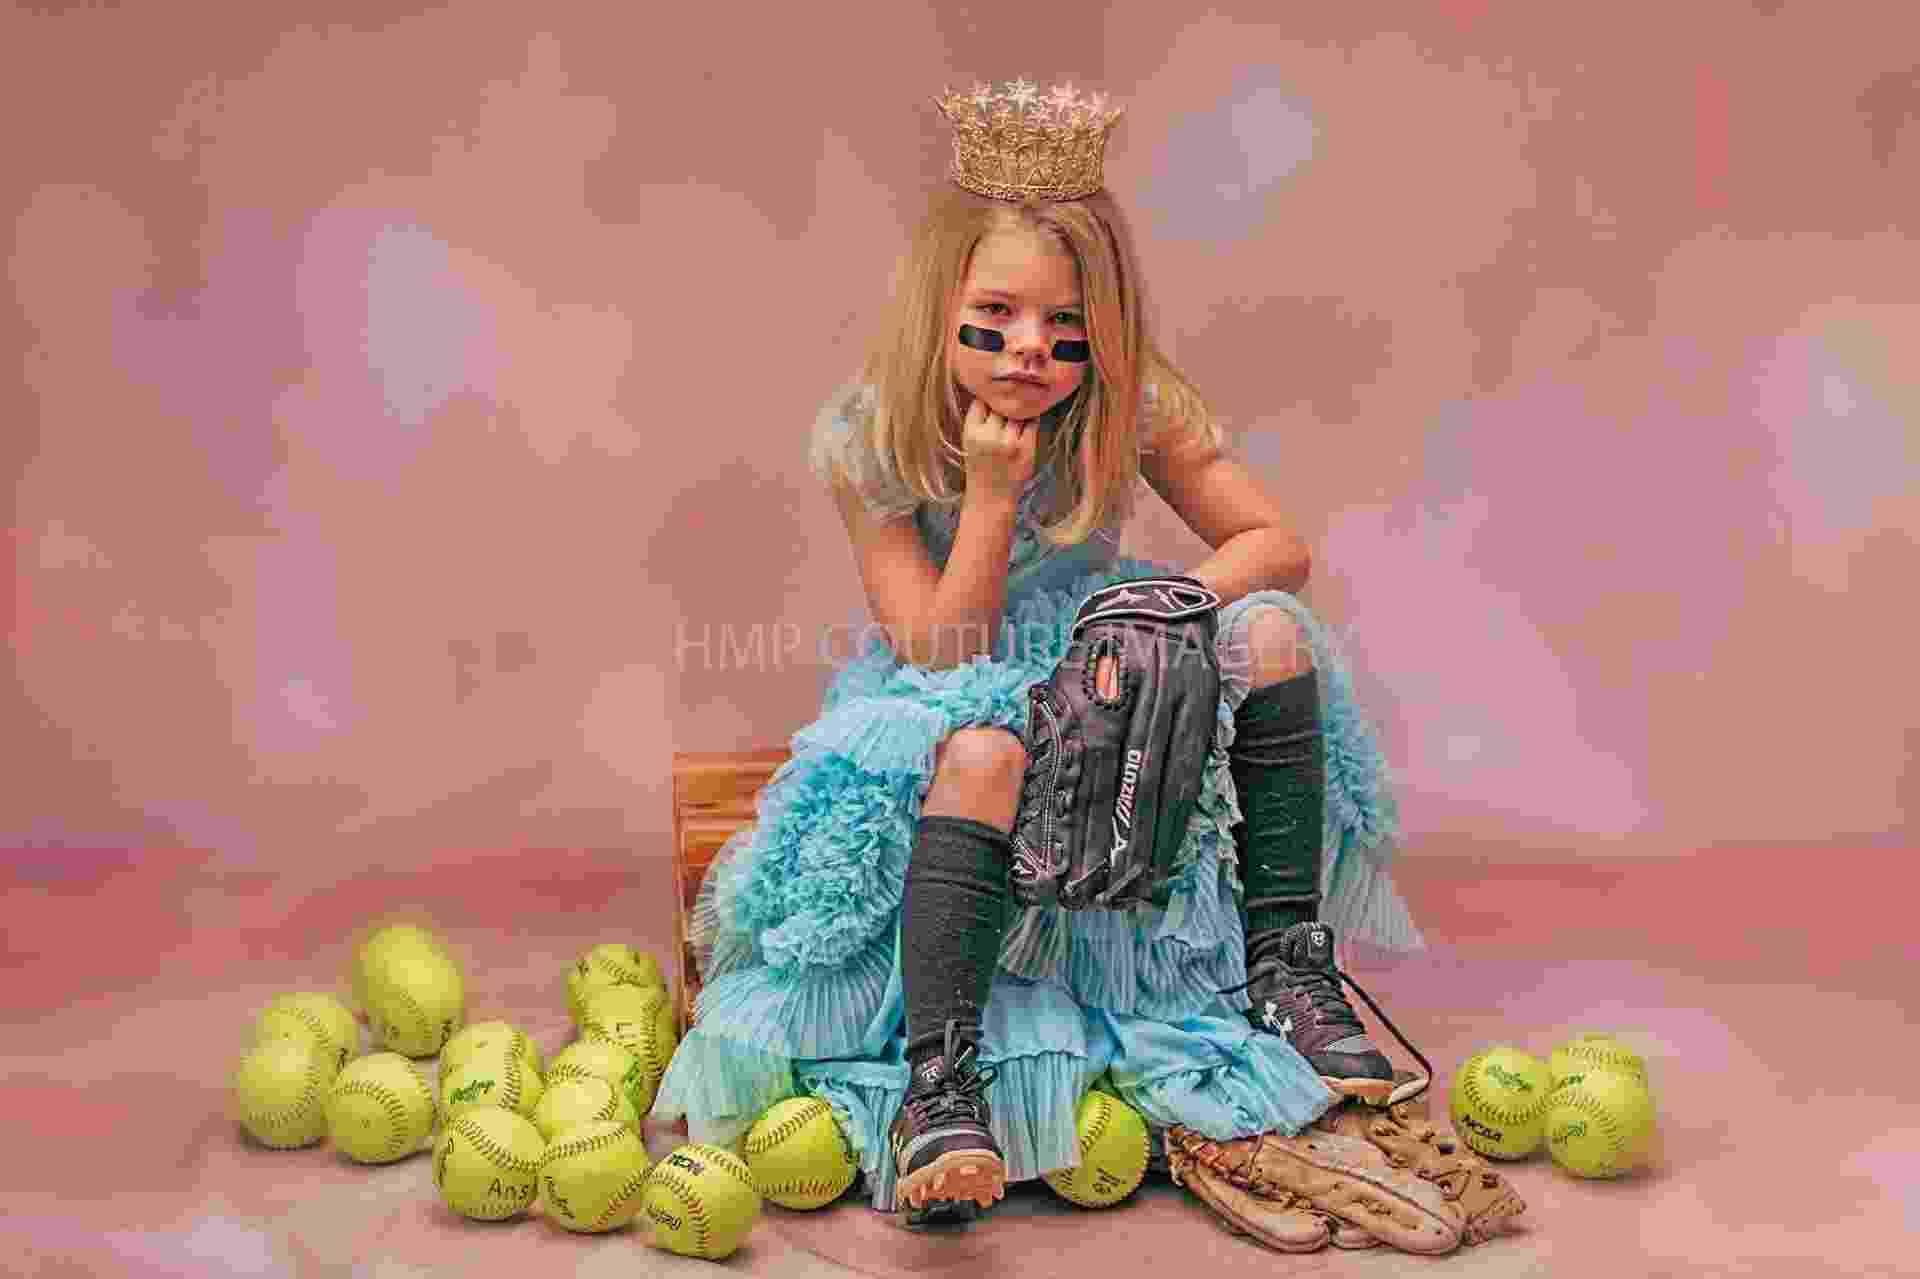 "Fotos de ""princesas duronas"" como guerreiras do esporte - HMP Couture Imagery"